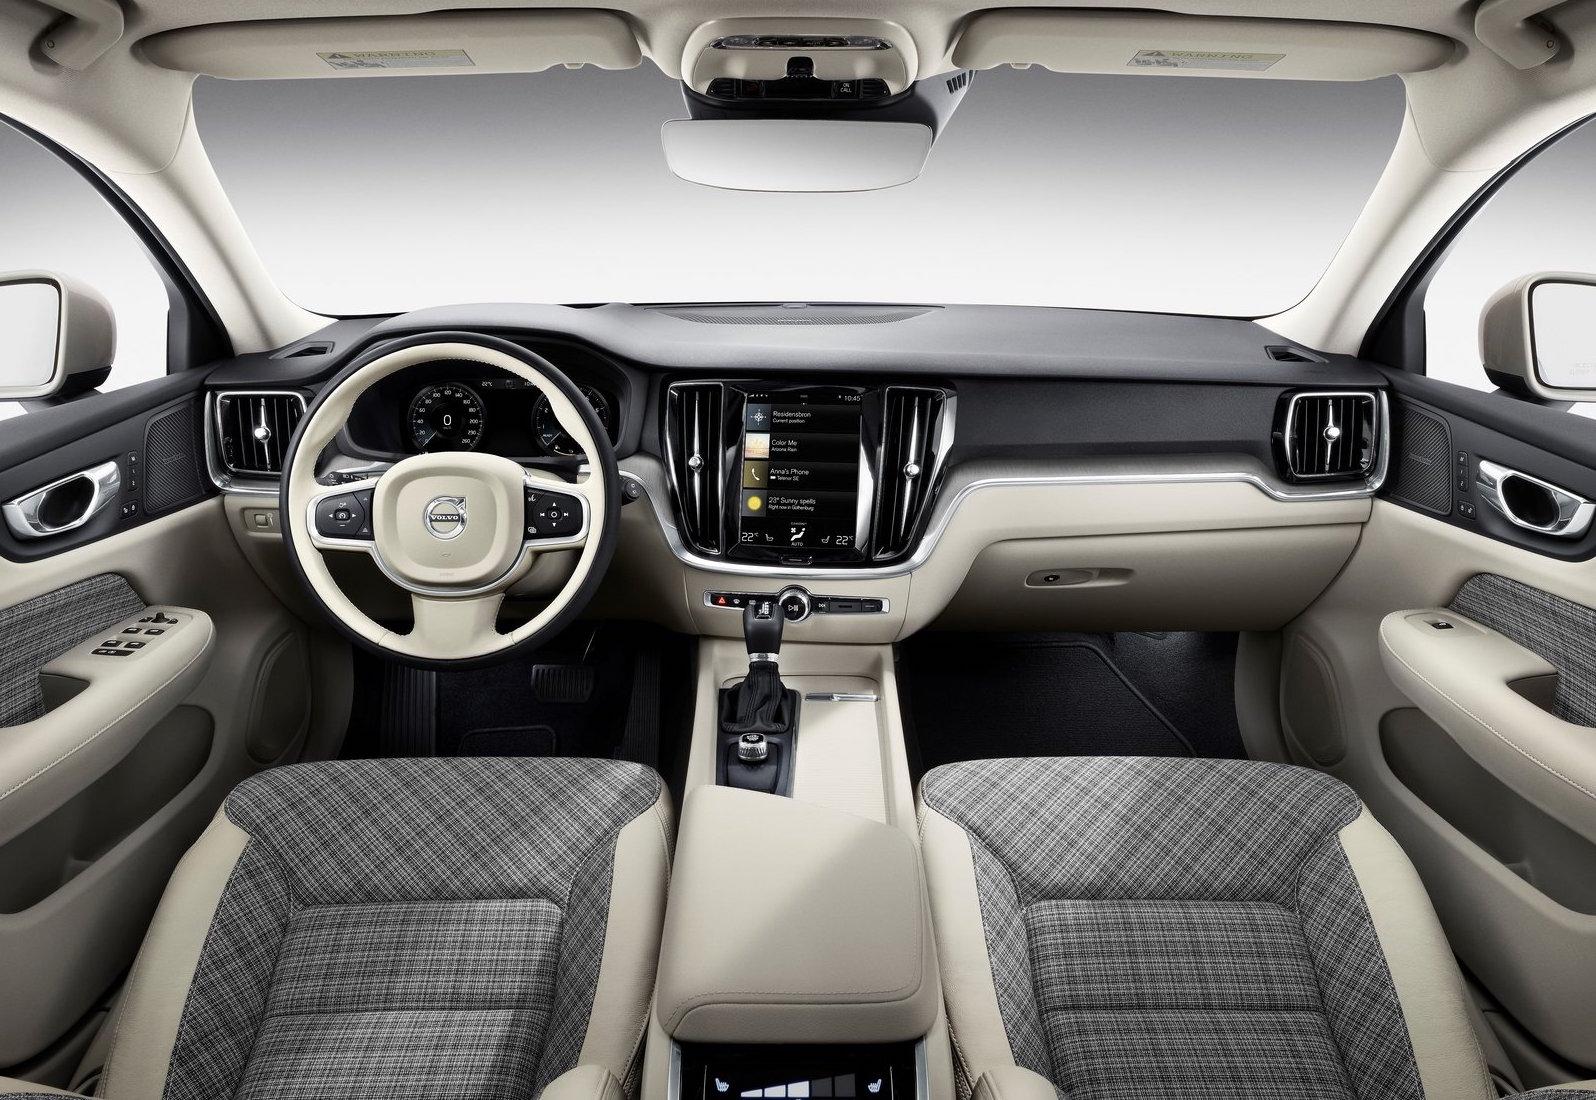 2019 Volvo V60 getting cool plaid textile interior trim option ...